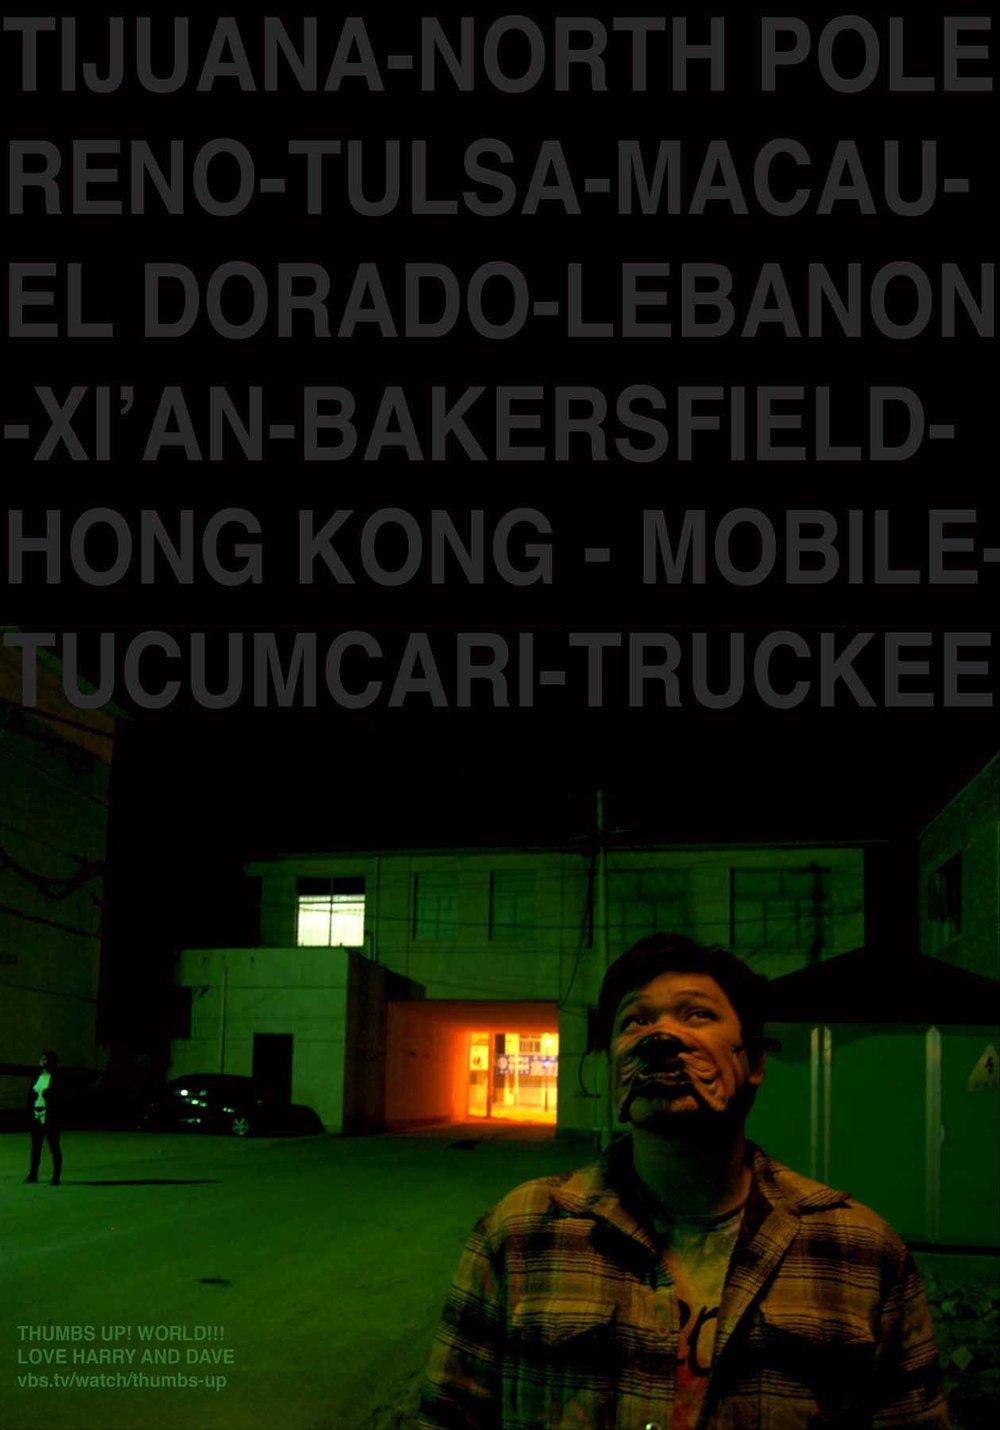 Thumbs Up! hitchhiking show poster - Dogface Harry - Tijuana, North Pole, Reno, Tulsa, Macau, El Dorado, Xi'an